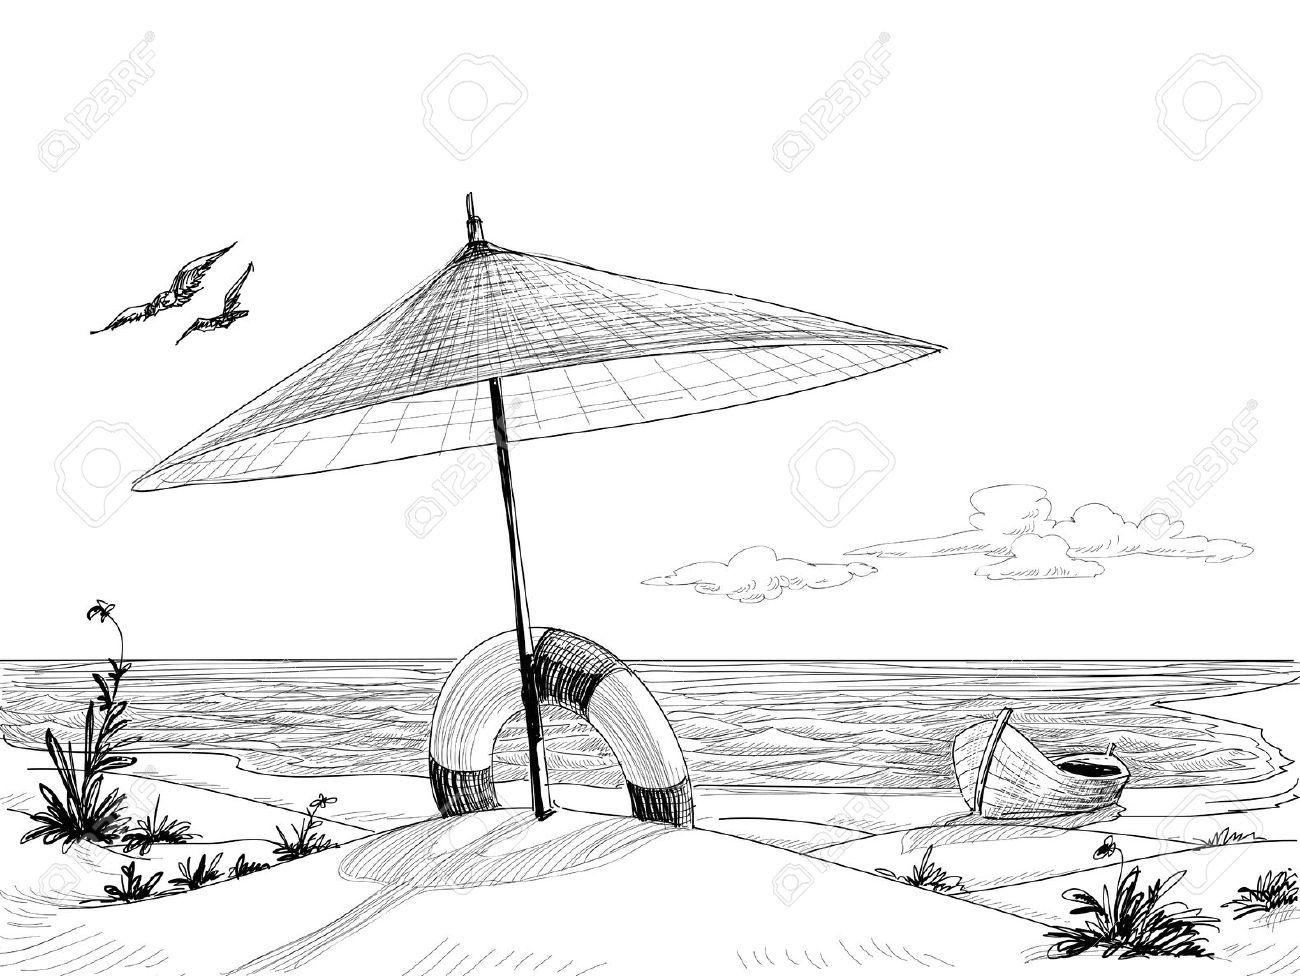 Beach chair and umbrella sketch - Vector